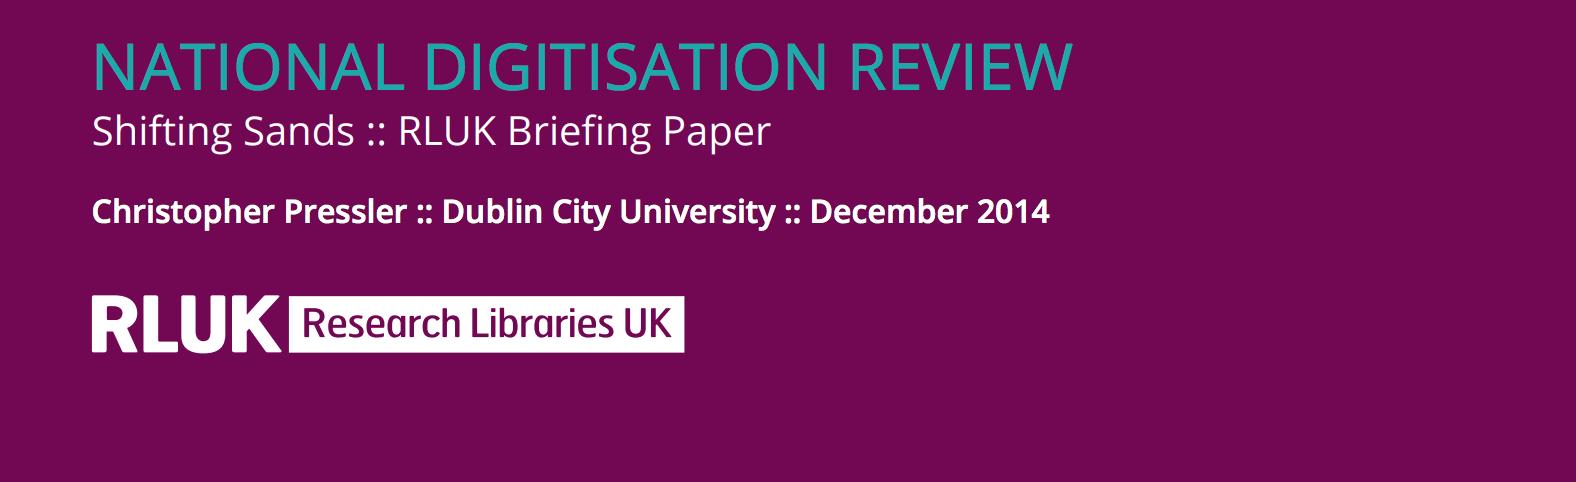 National digitisation review